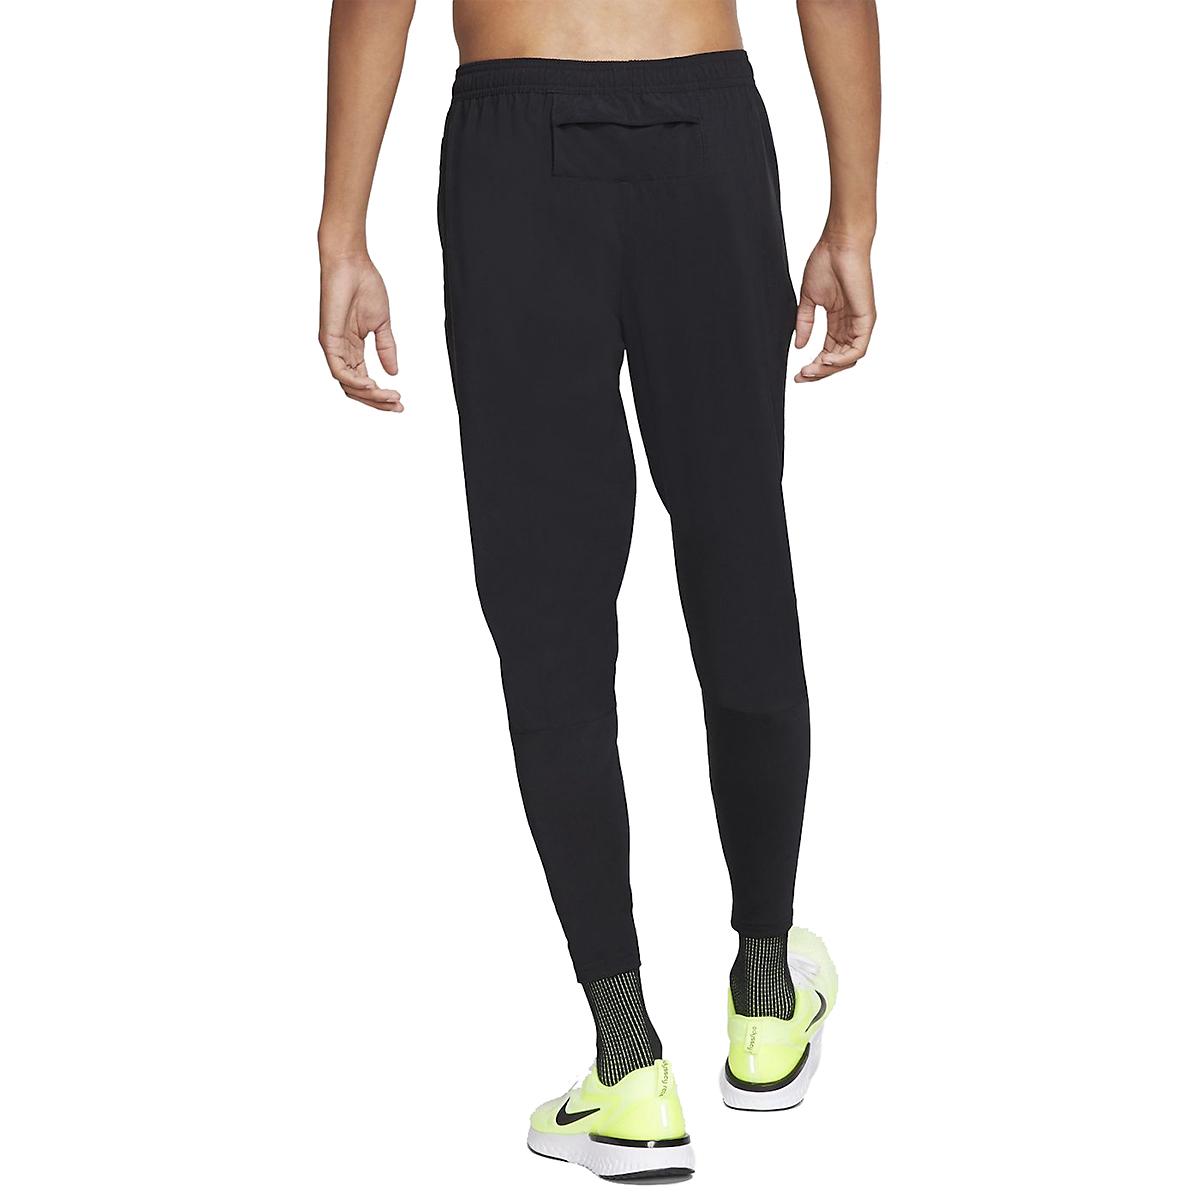 Men's Nike Phenom Essential Pant - Color: Black/Reflective - Size: S, Black/Reflective, large, image 2